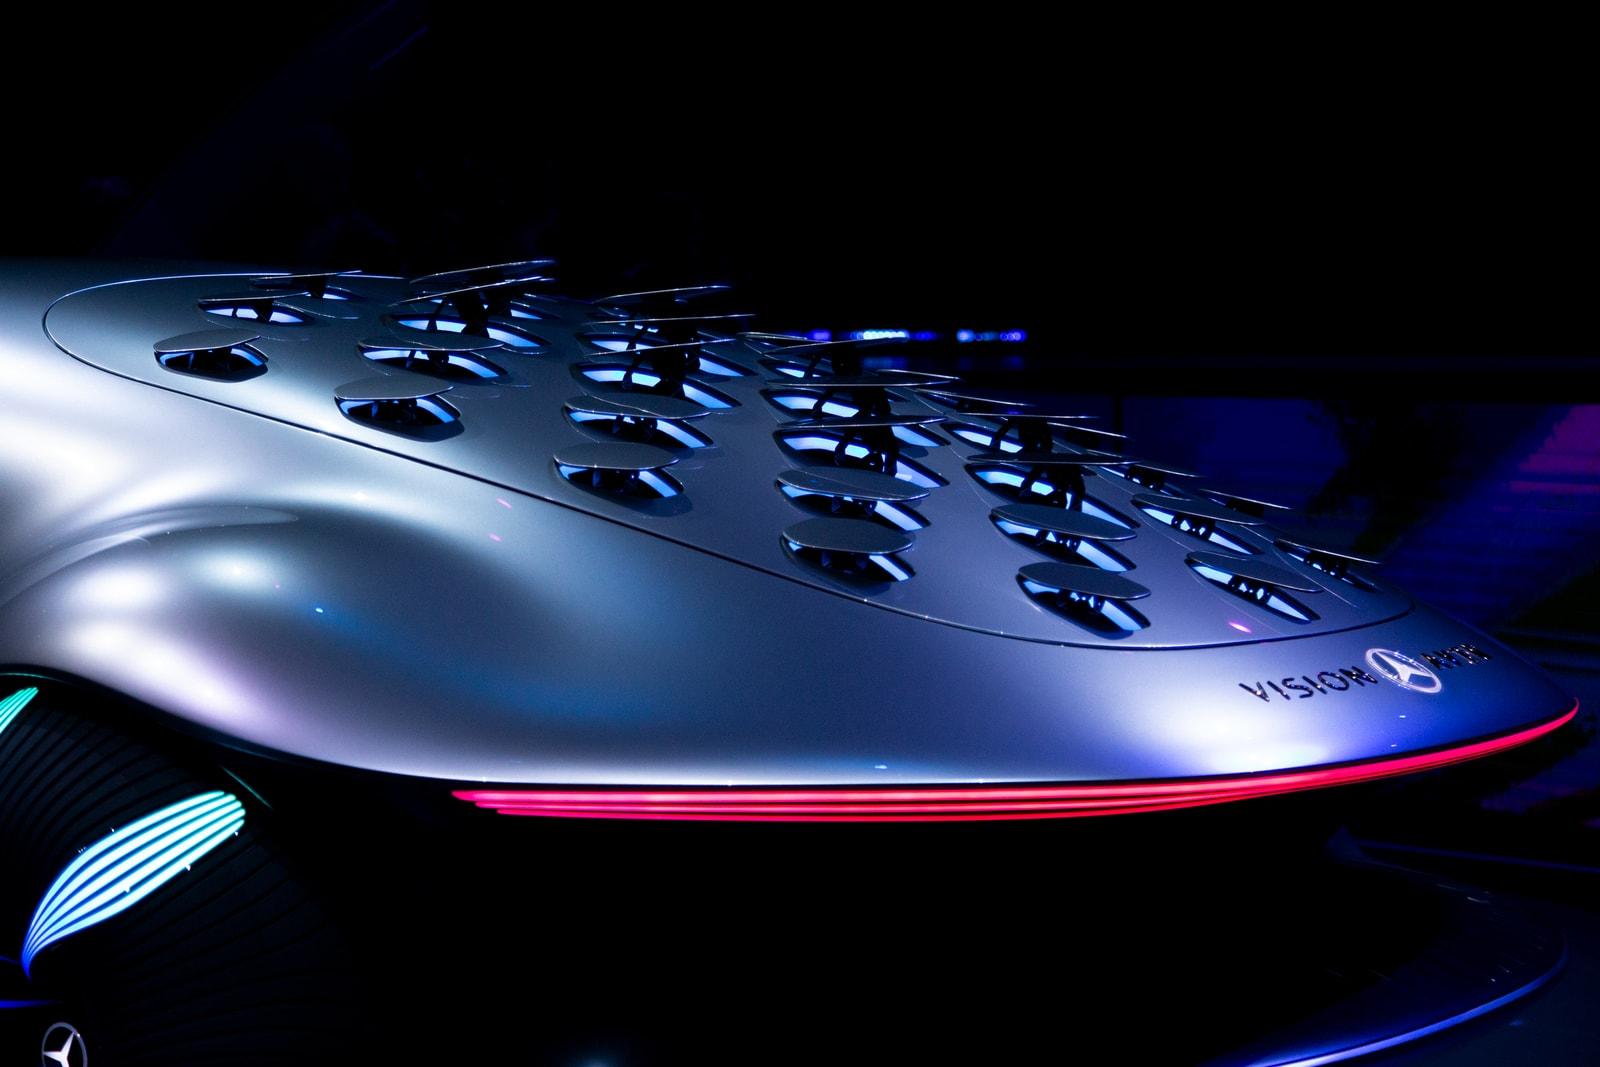 Mercedes-Benz x Avatar Vision AVTR First Look James Cameron Movie